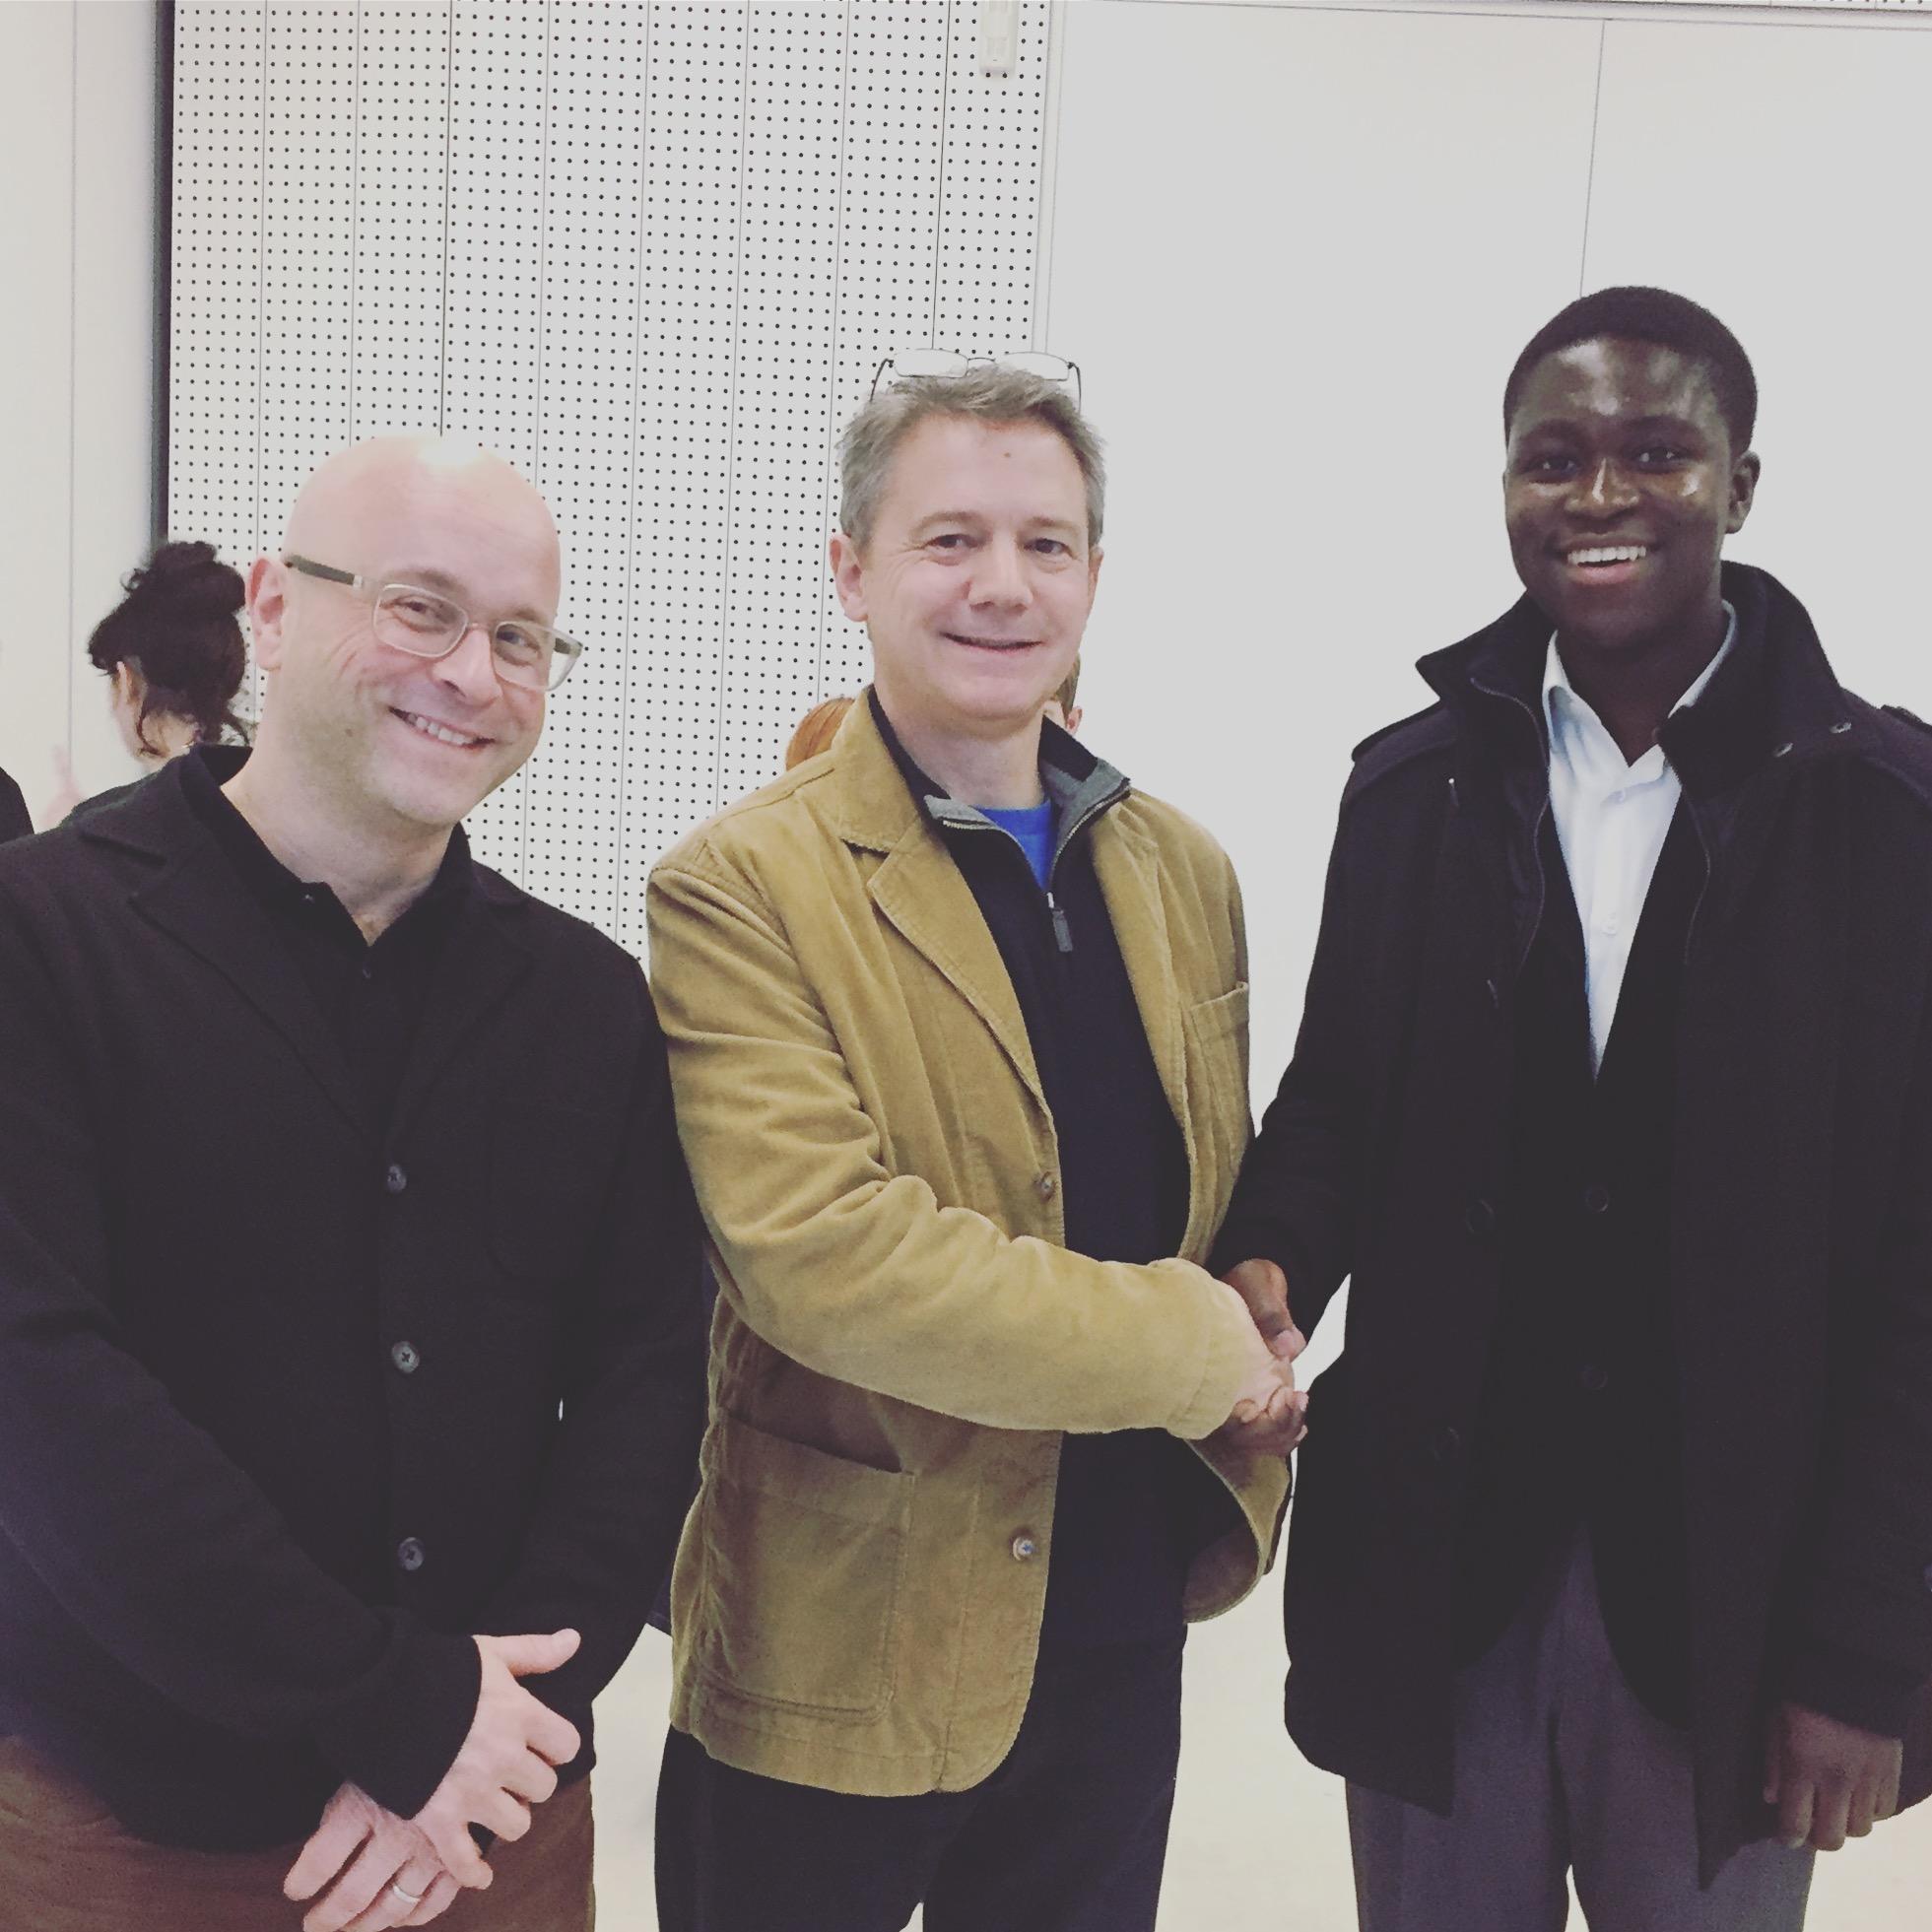 Left to right: artist and Platform mentor Jonathan Parsons, Tim Meacham, Lecturer in Fine Art, University of Kent and Daniel's university tutor, and Platform Graduate Award 2016 winner, Daniel Owusu.